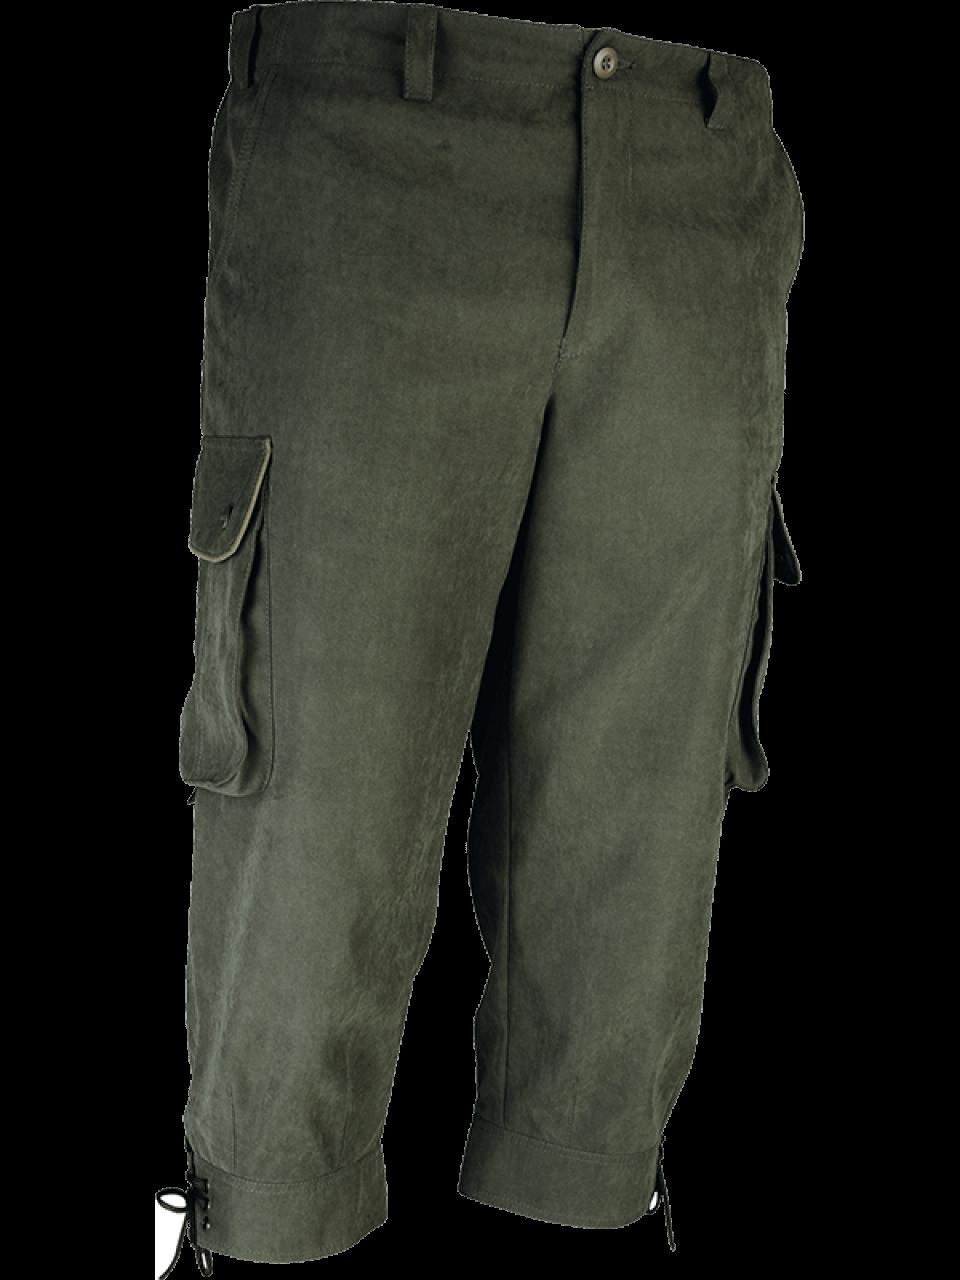 Nohavice Horton trojštvťové 1